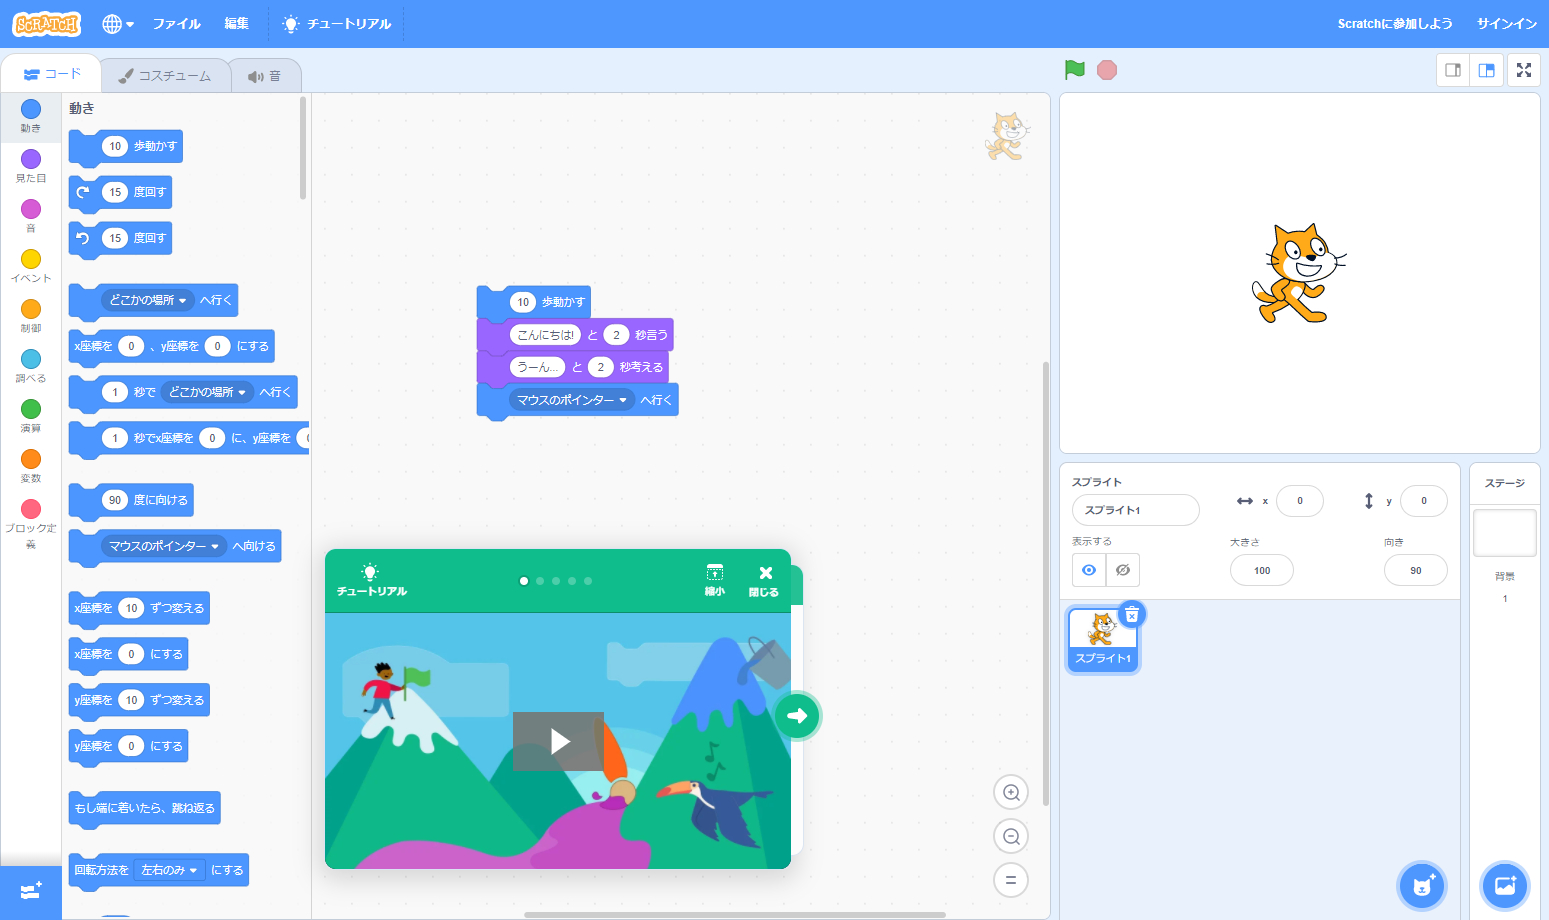 MIT開発のビジュアルプログラミング環境「Scratch」。絵で理解しやすいよう工夫されたソフトウェアが近年子どものプログラミング学習向けに開発されている